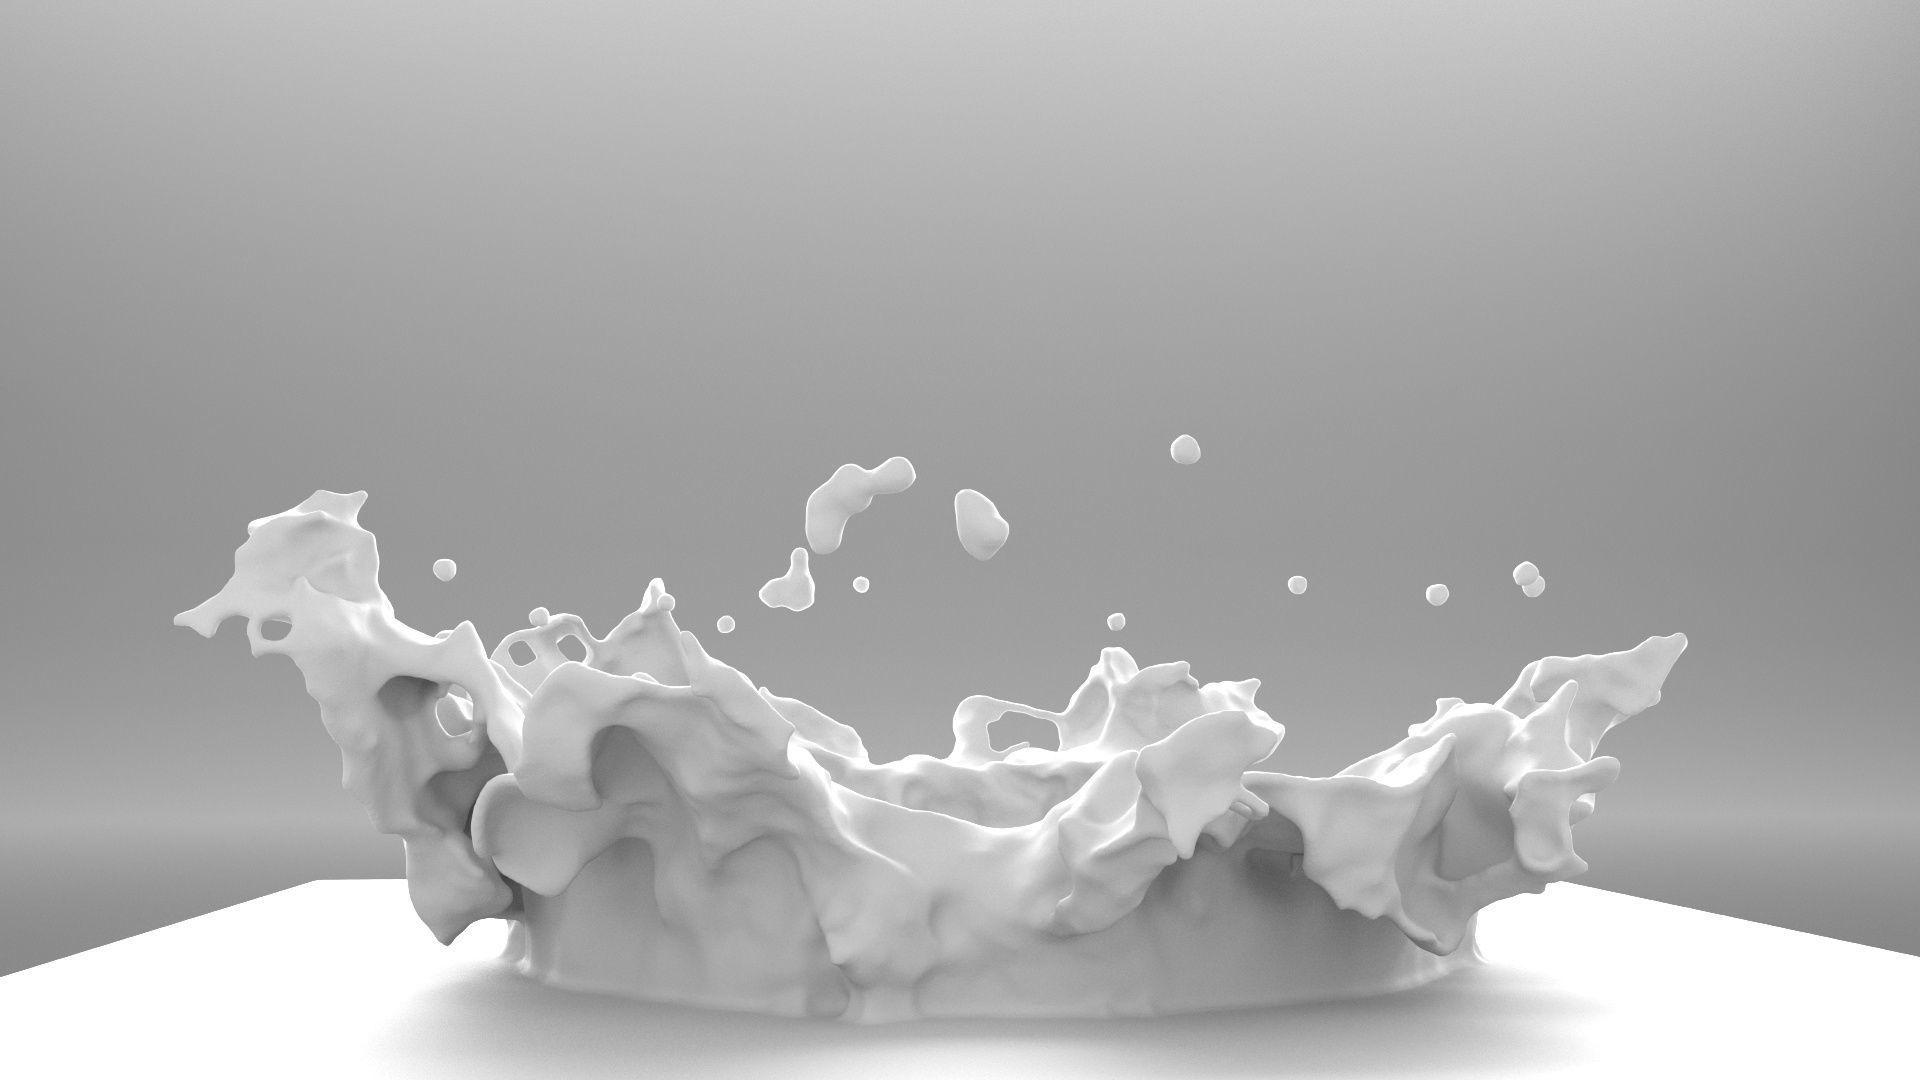 water splash crown shape